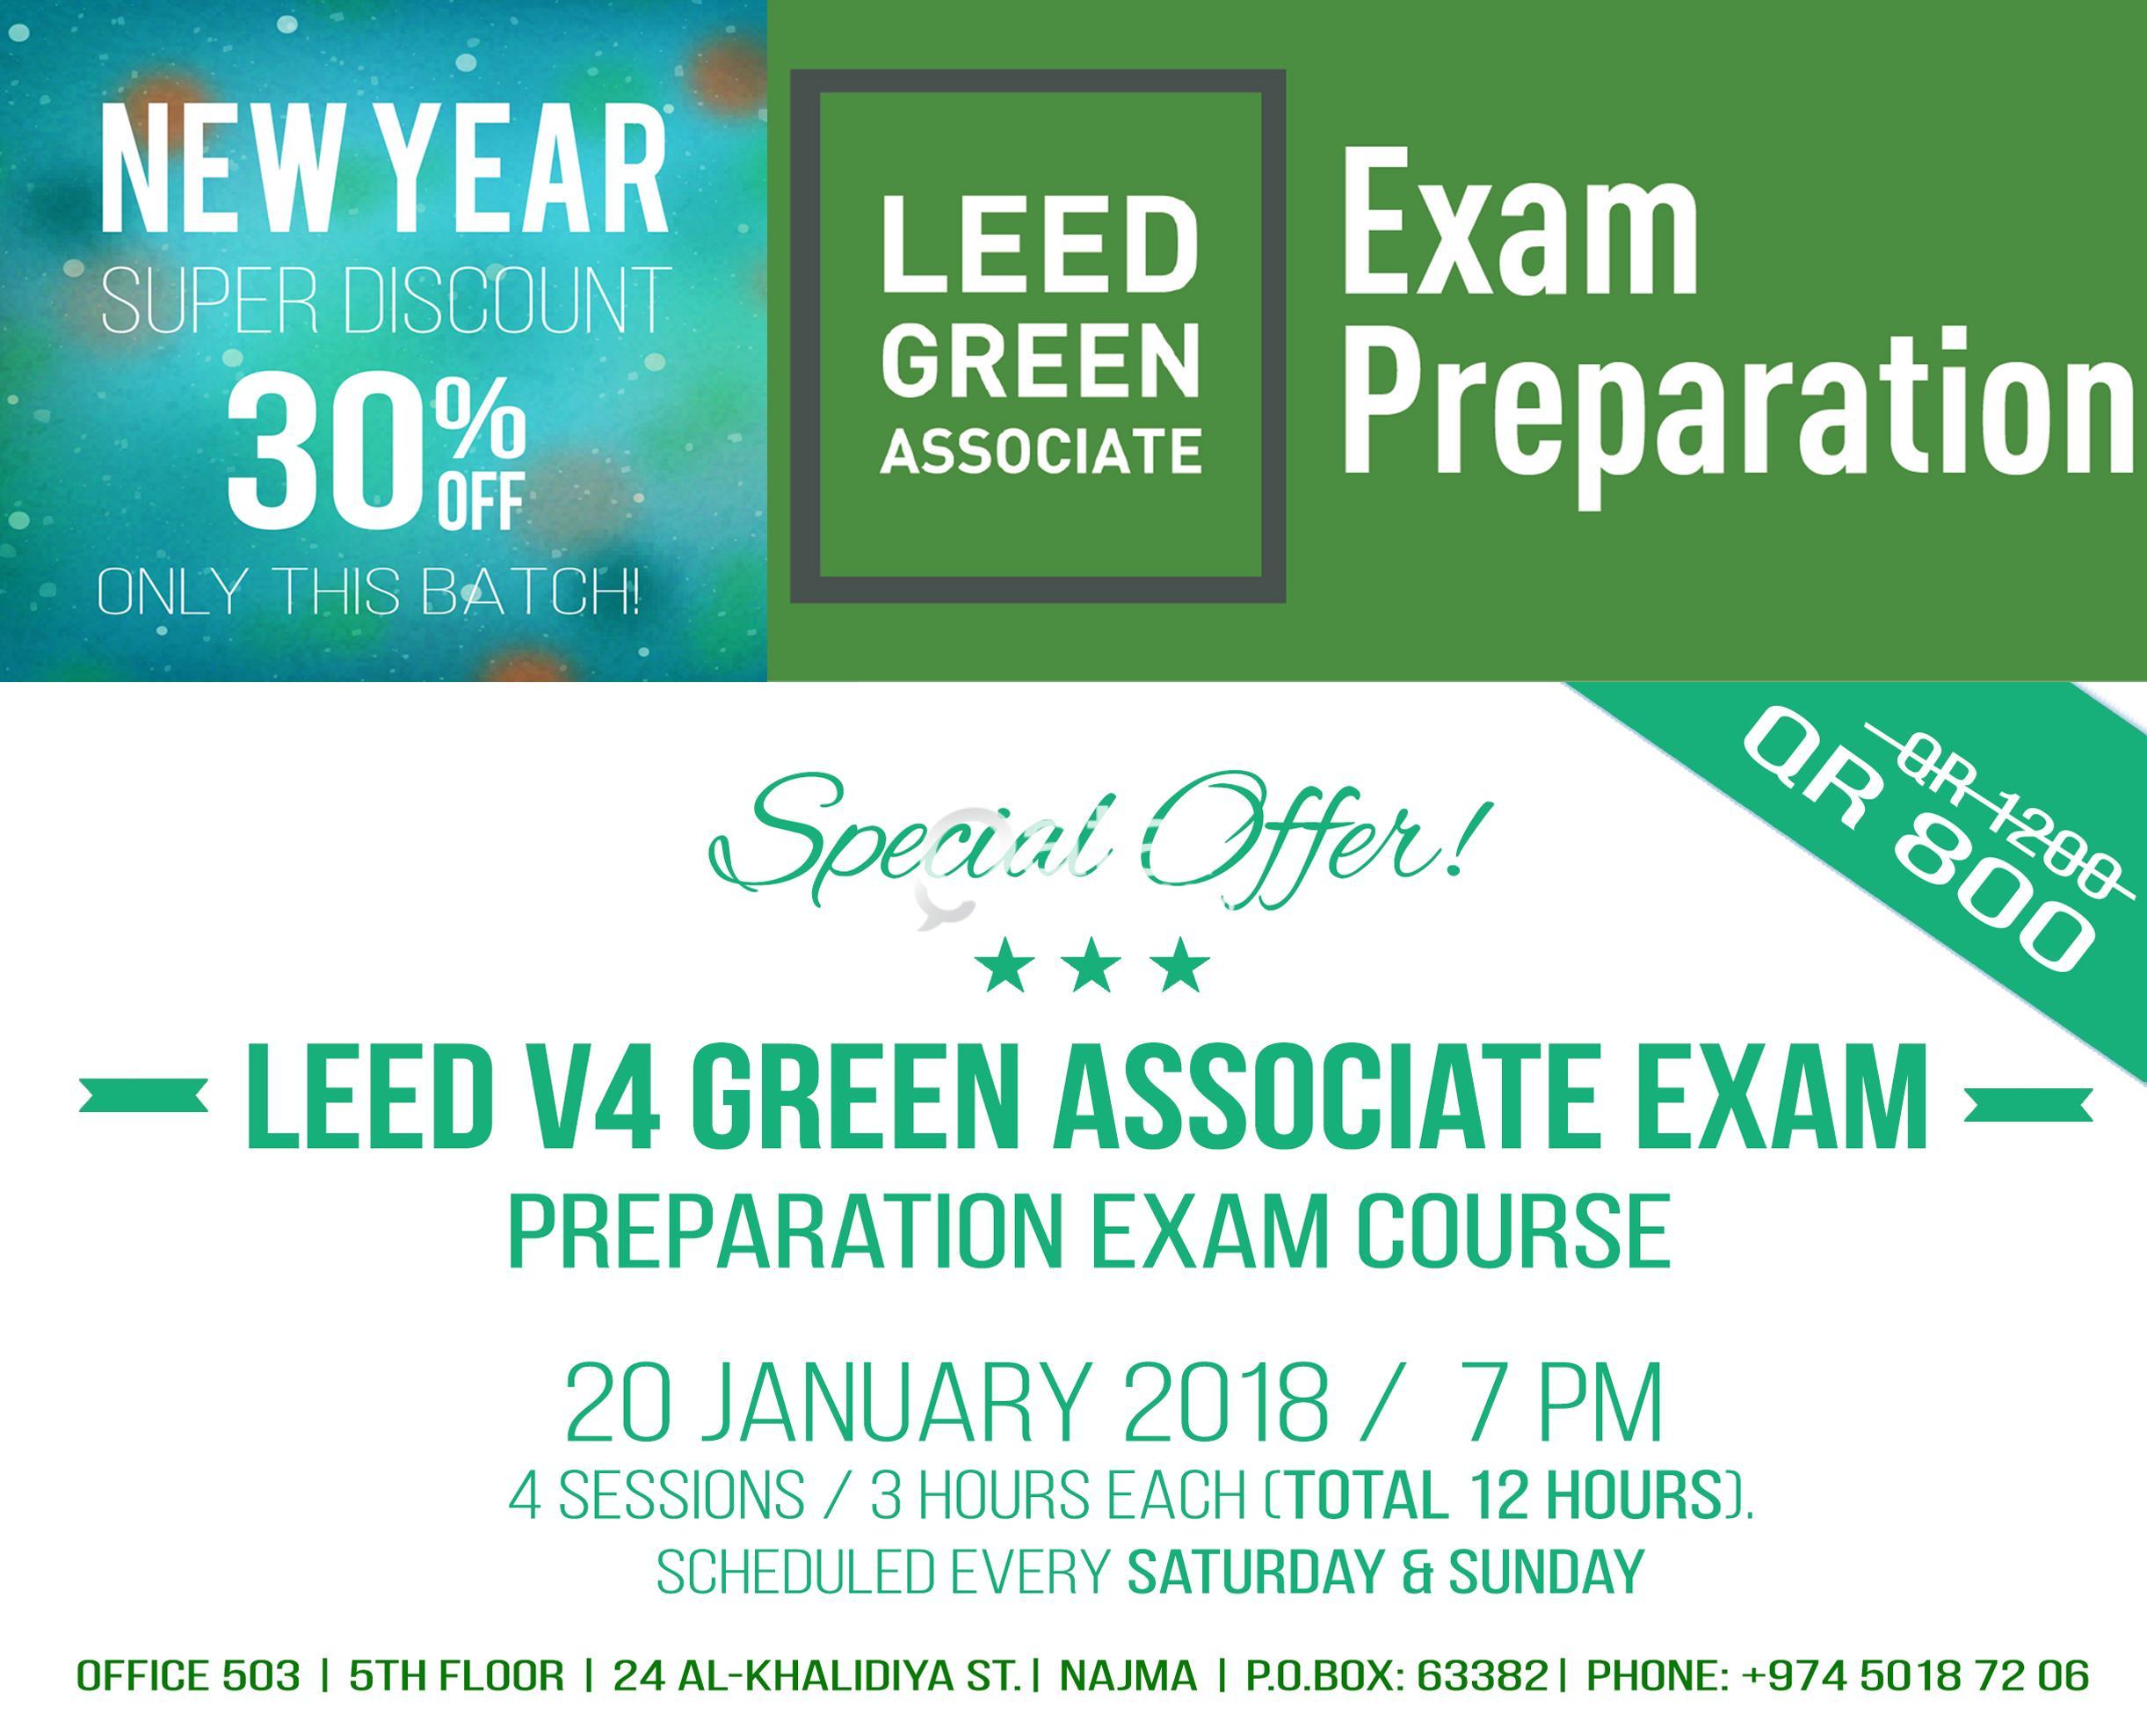 Leed V4 Green Associate Exam Prep Course 20 January 2018 Qatar